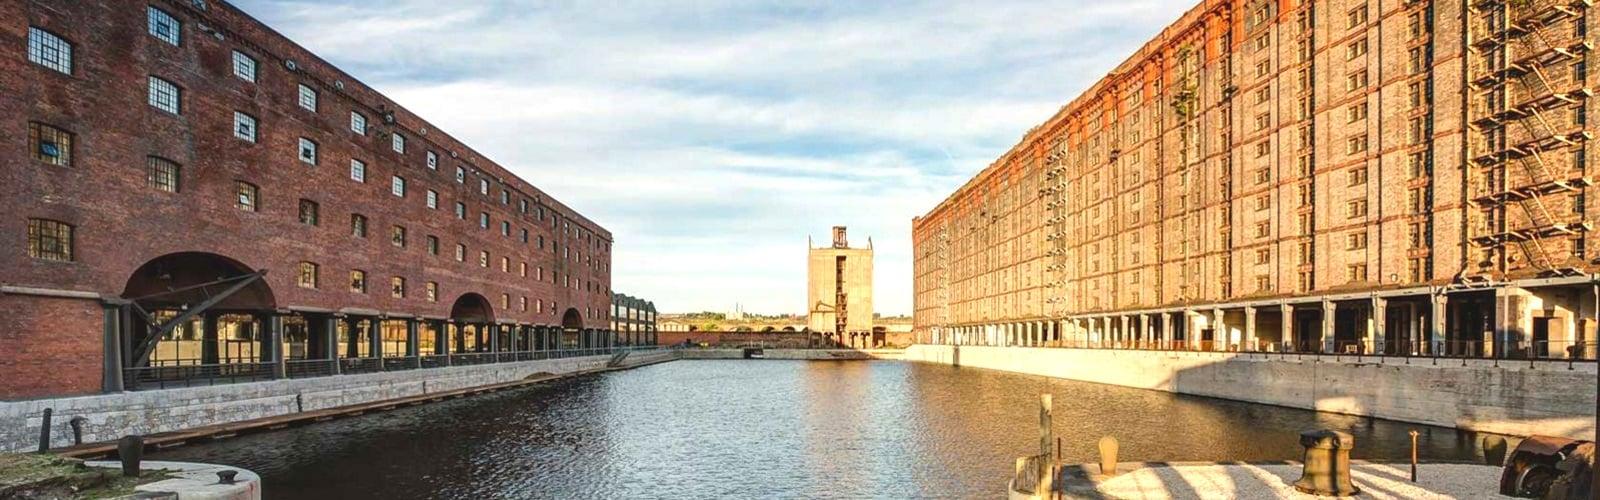 Our venue, Liverpool's magnificent Titanic Hotel